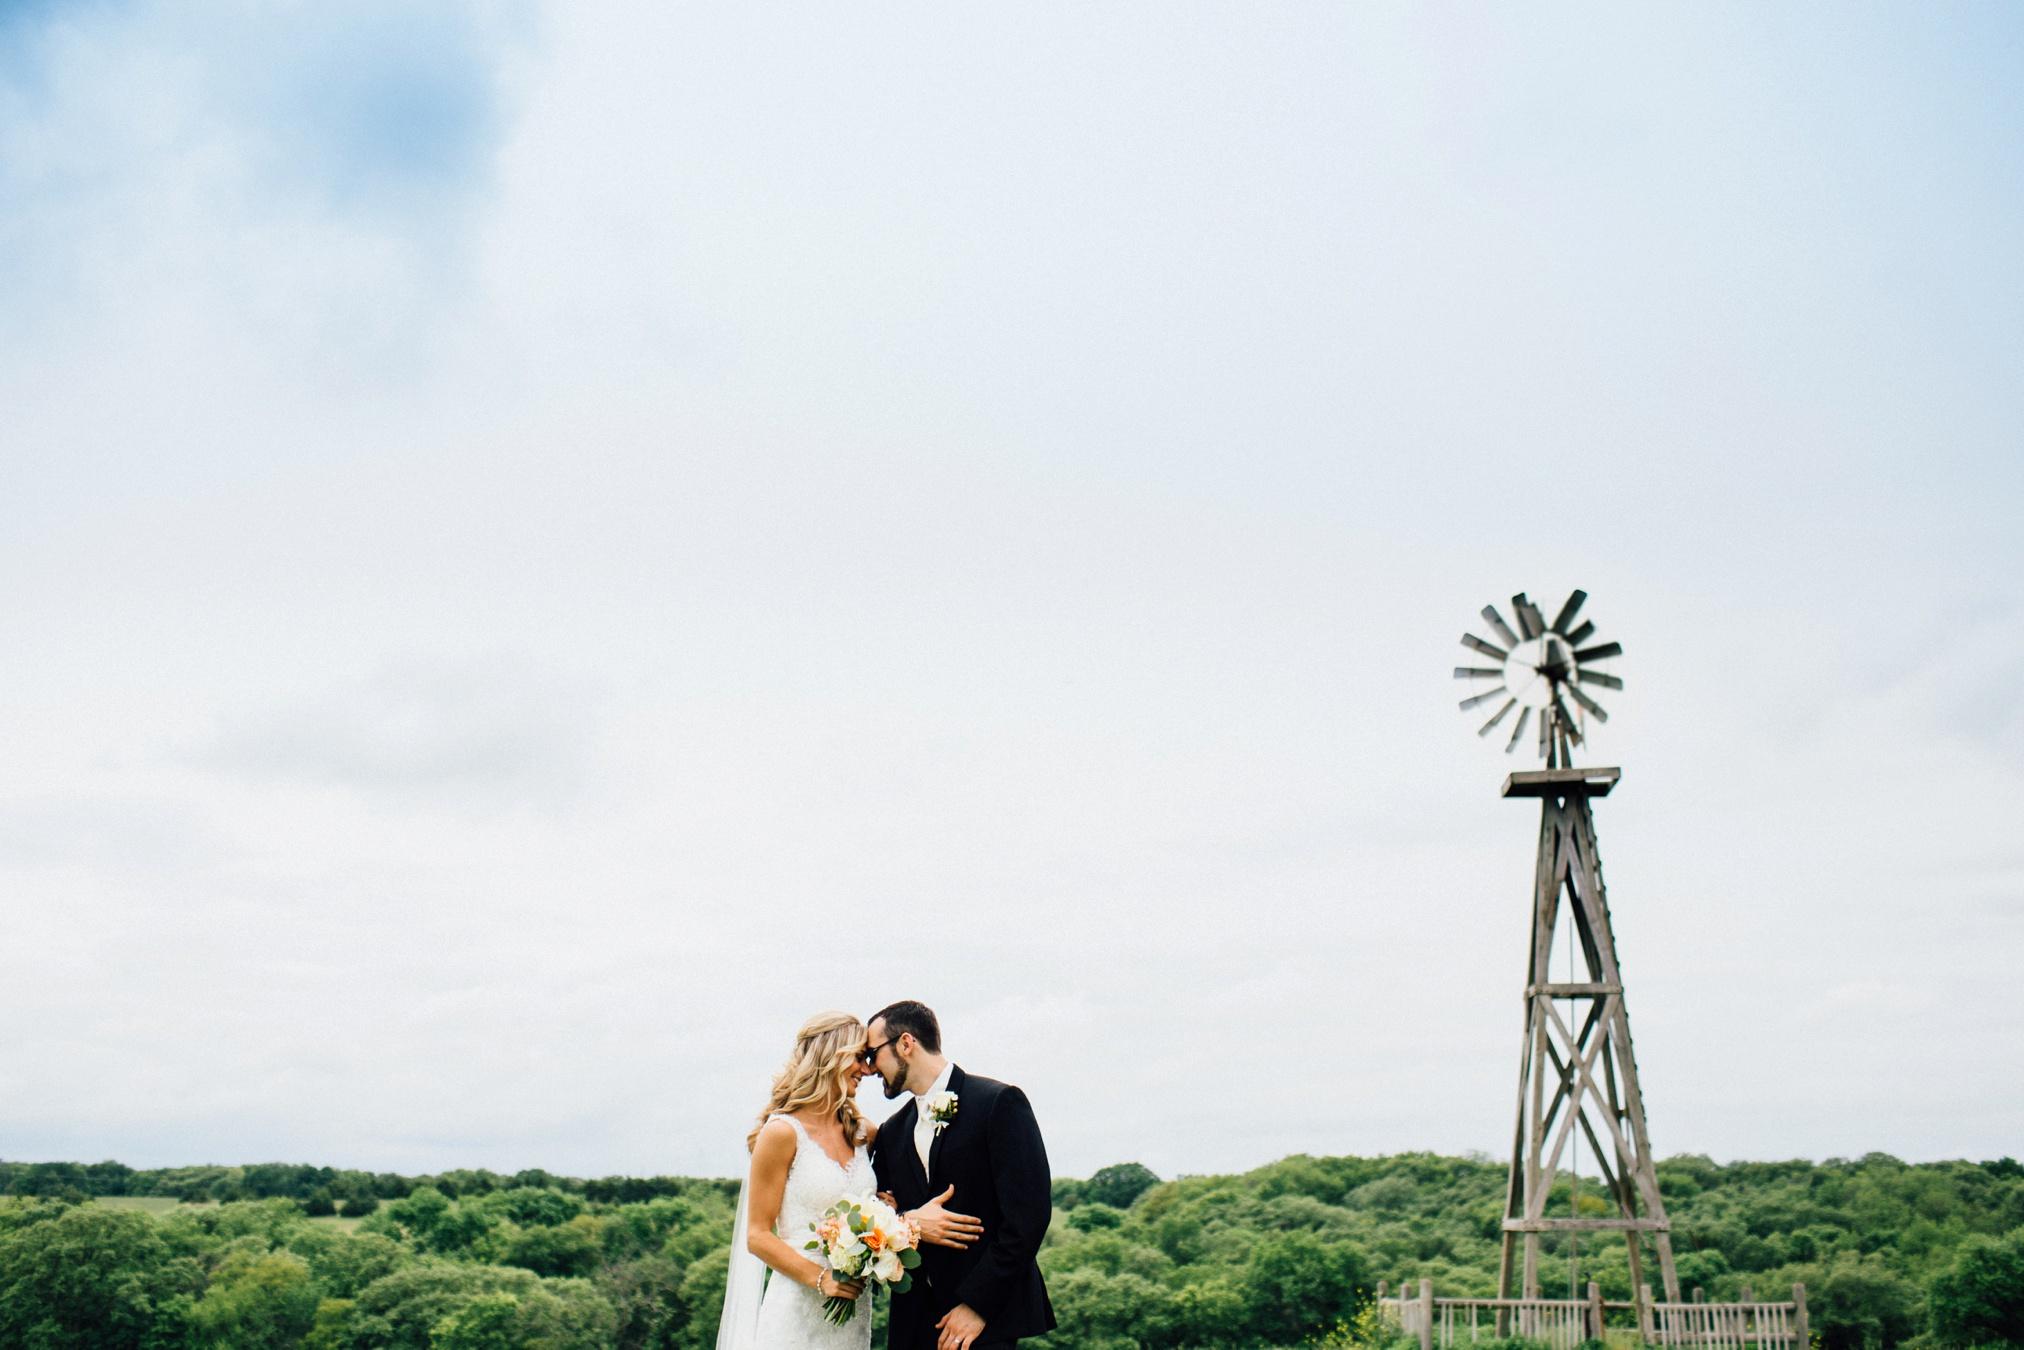 schmid_wedding-630.jpg